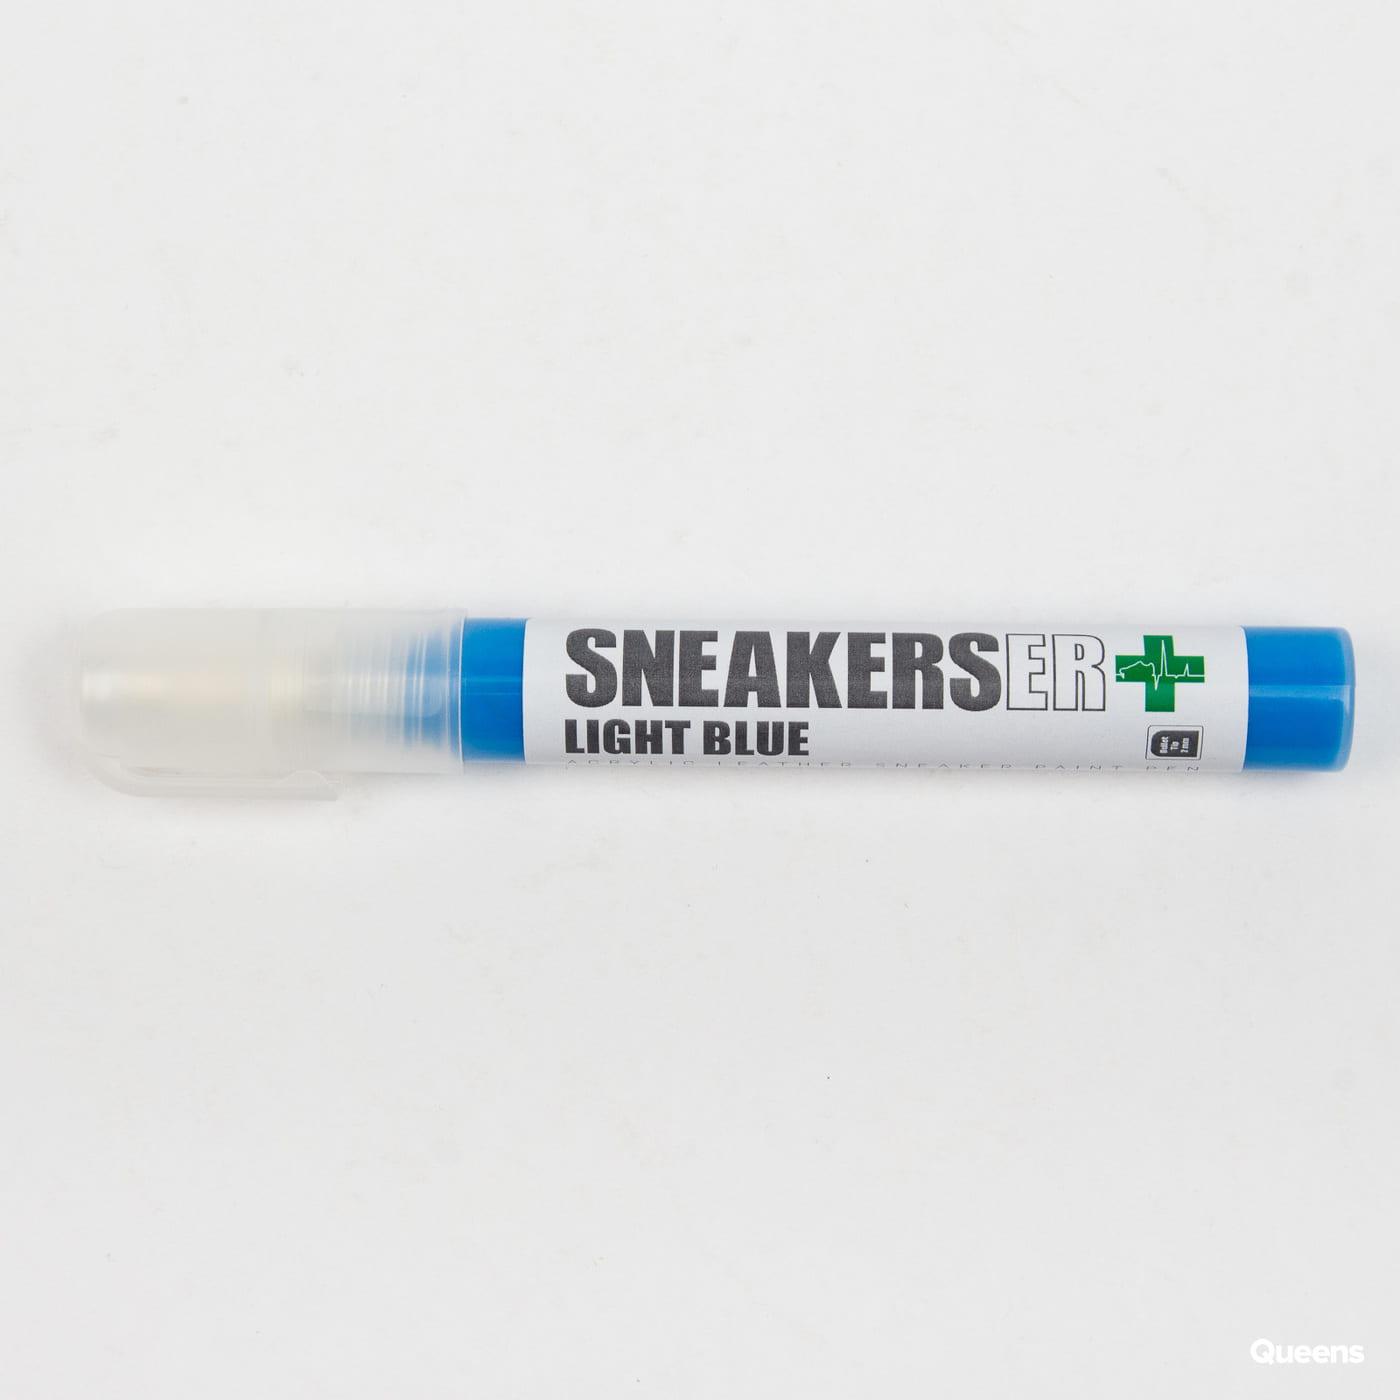 SNEAKERS ER Light Blue Acrylic Paint Pen 2 mm modrý